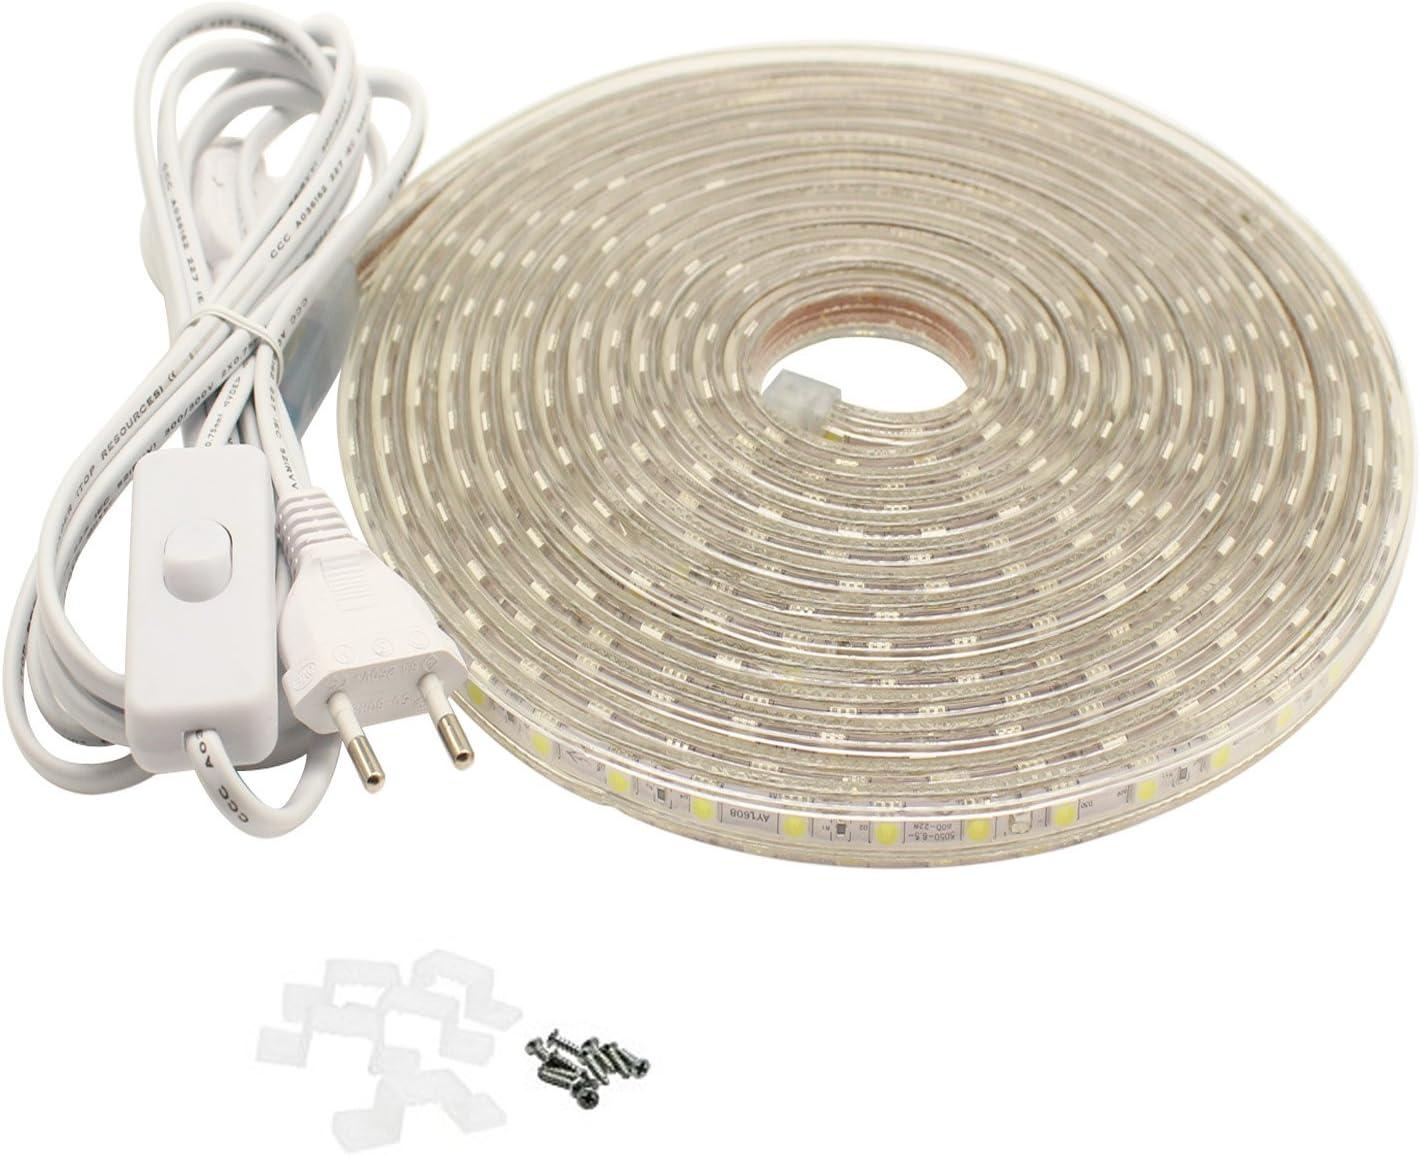 Tiras LED 5M con Interruptor, 220V IP65 Impermeable 5050 SMD ...